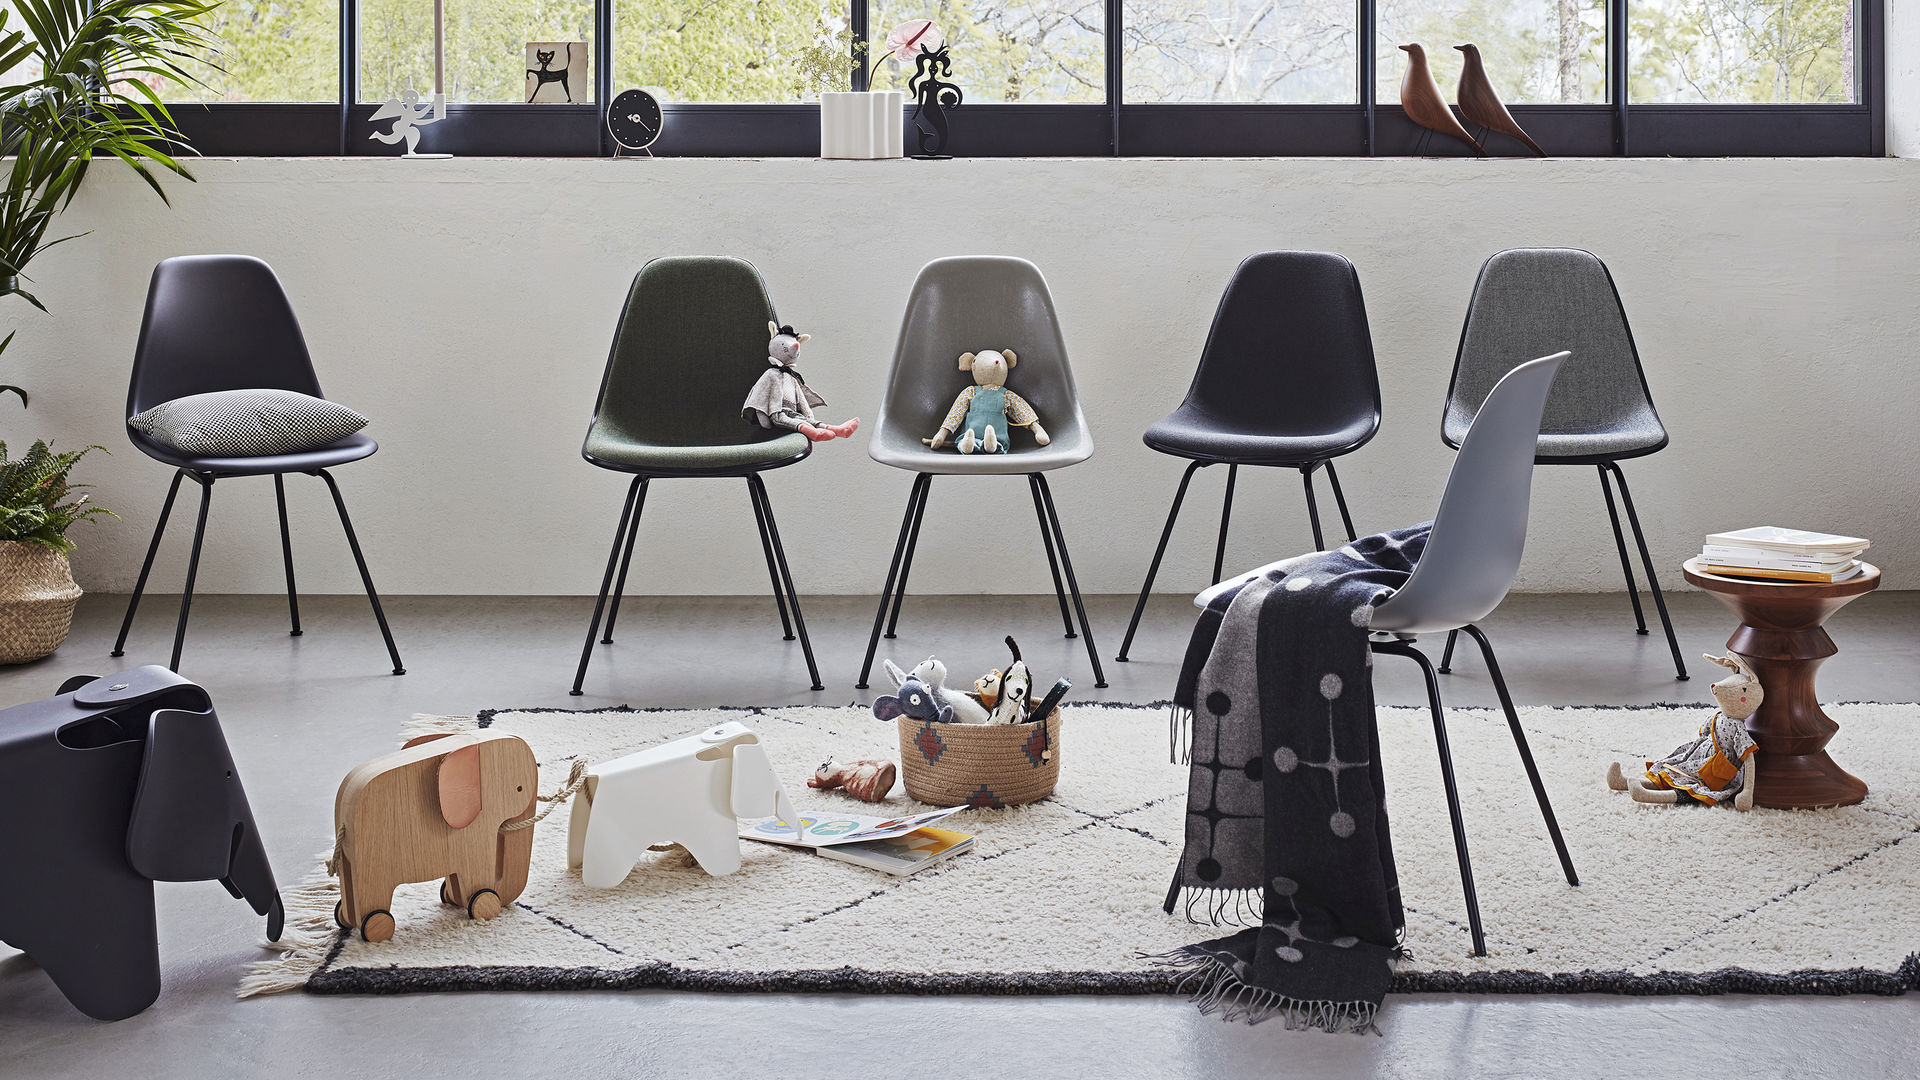 Eames Plastic Side Chair DSX Eames Fiberglass Side Chair DSX Eames House bird Eames_Web_16-9